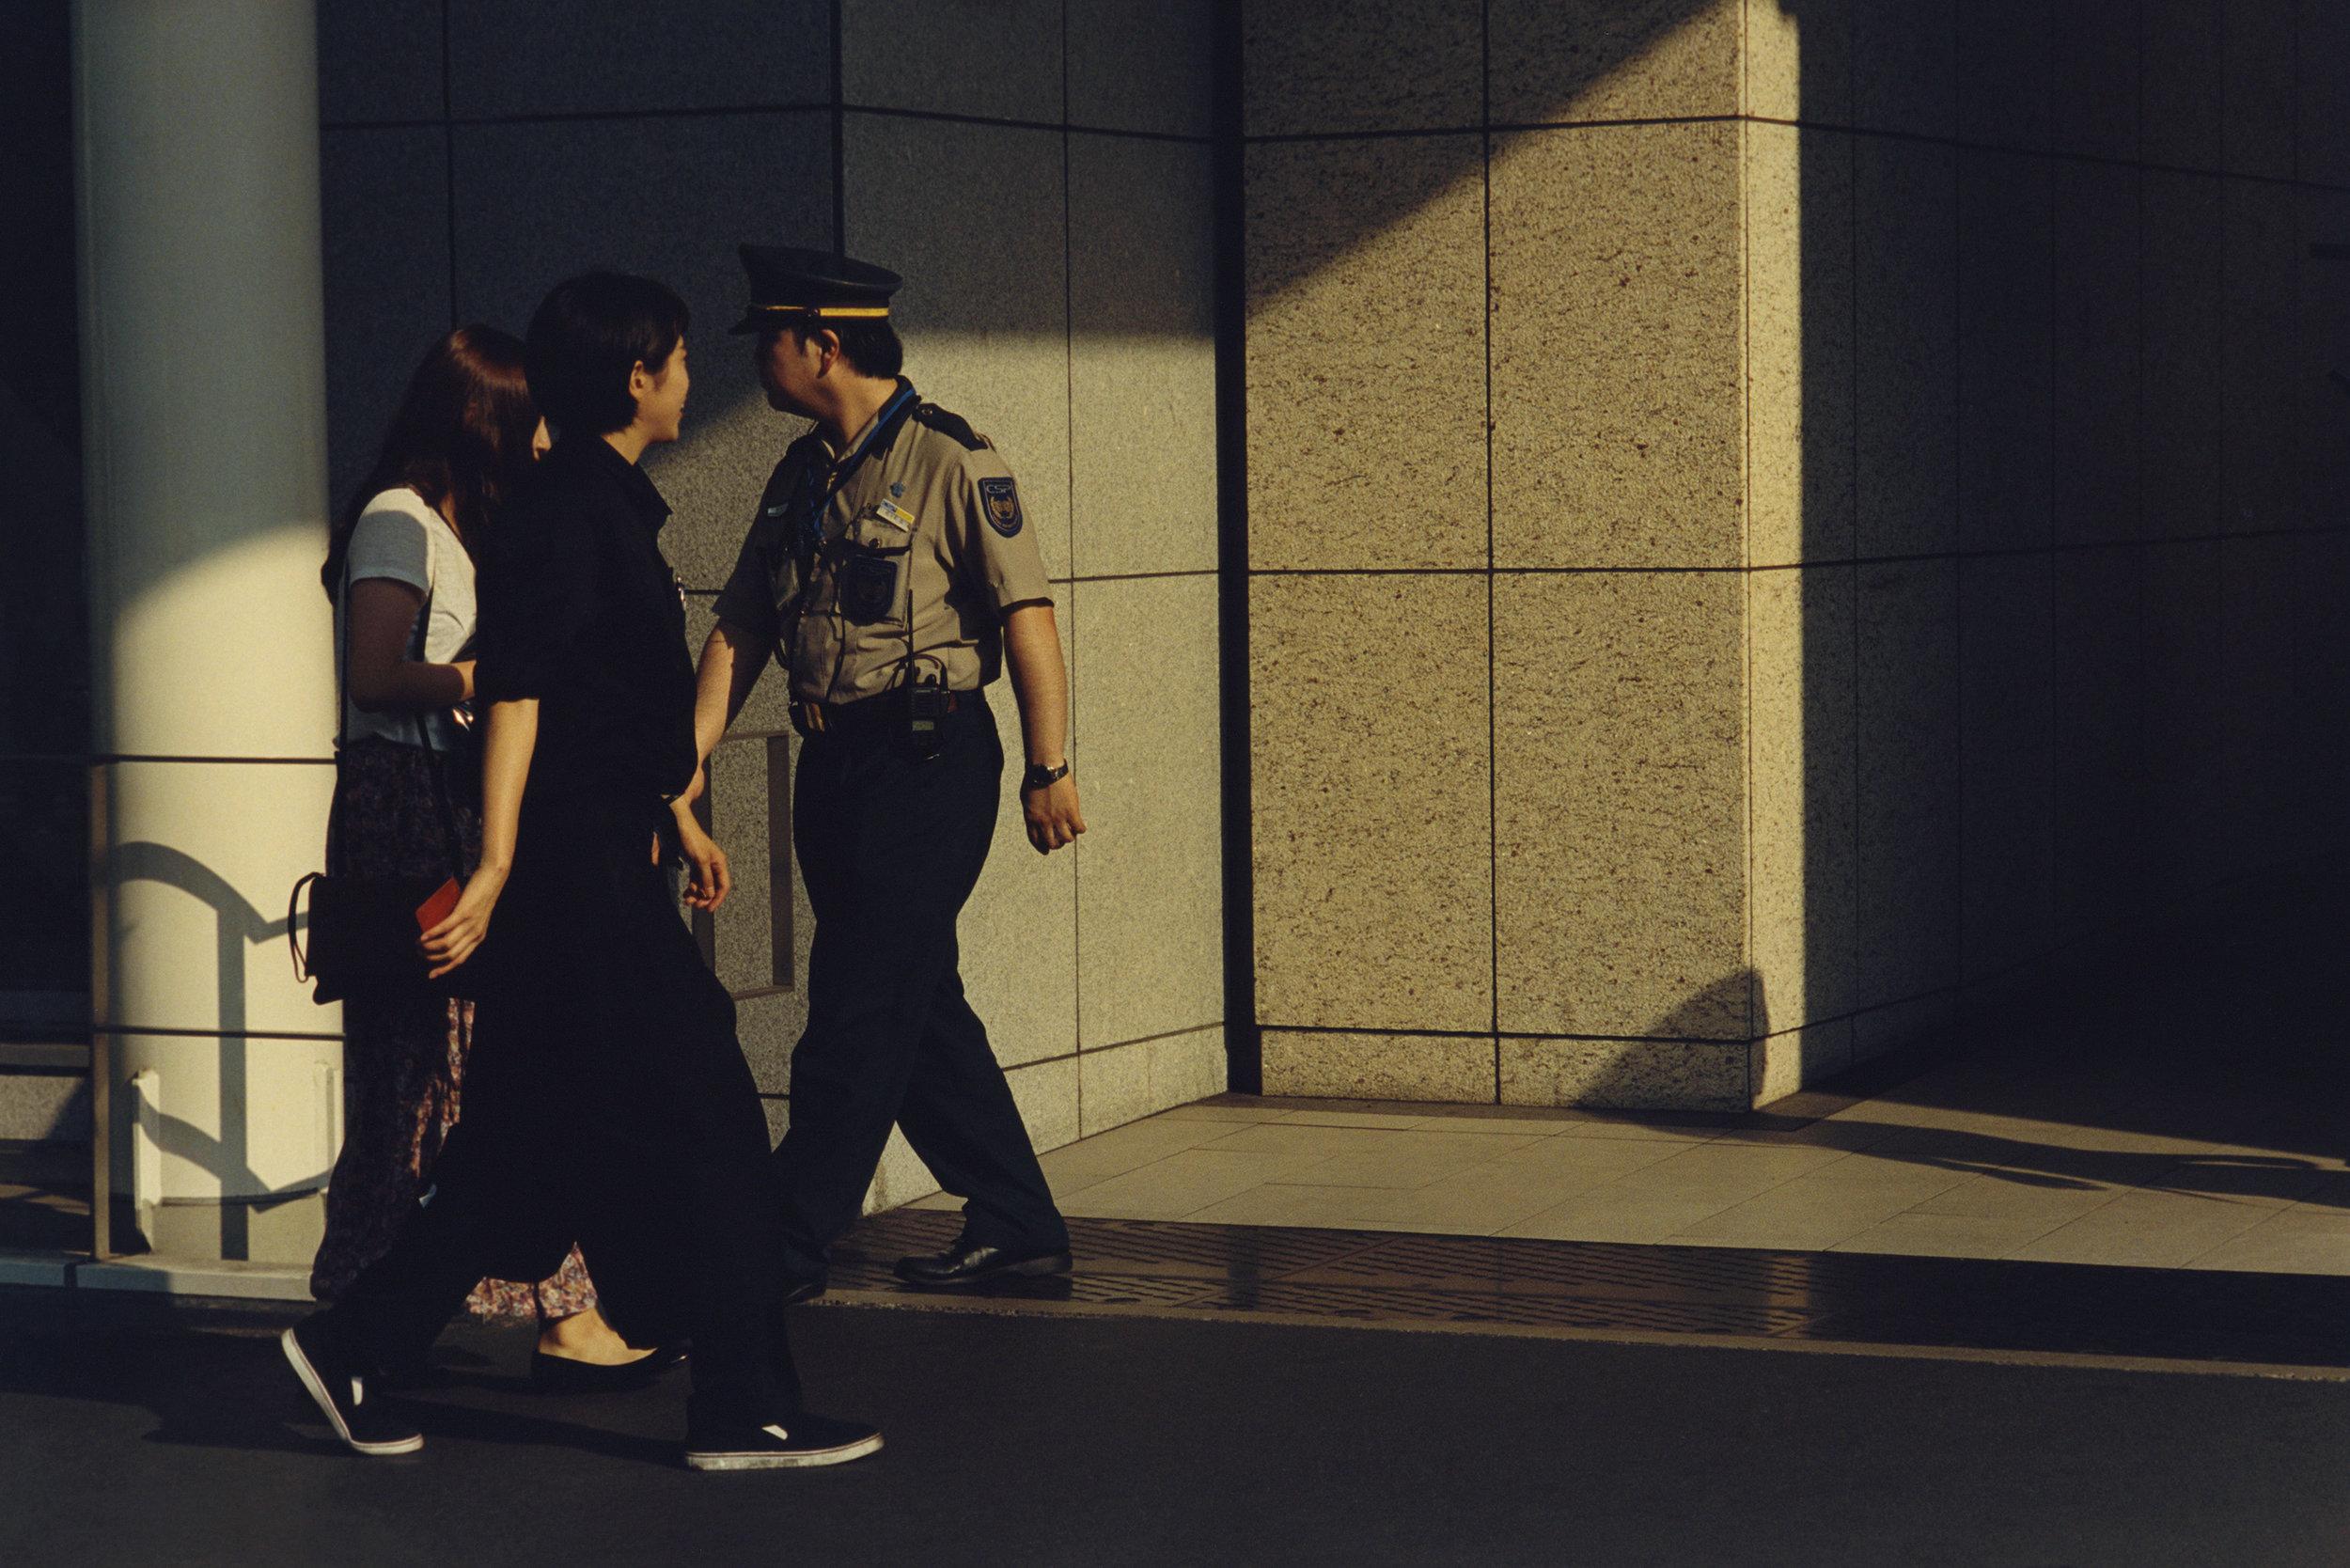 LJC_MUSE_TOKYO_35mm_ 26_sRGB.jpg